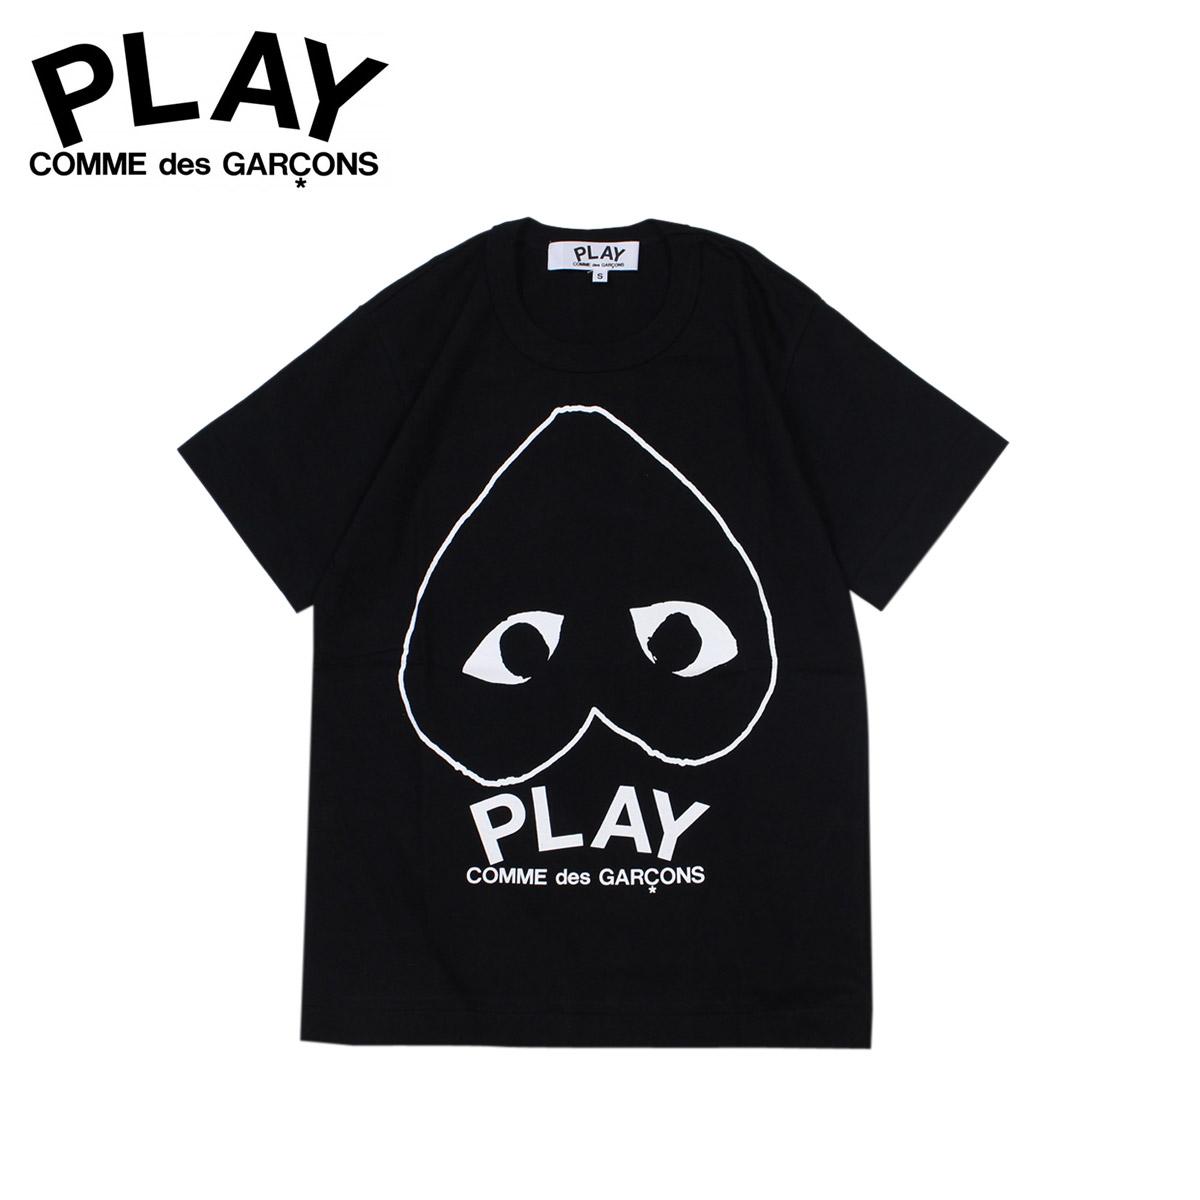 Sugar Online Shop: COMME des GARCONS PLAY T-shirt short sleeves コムデギャルソンレディース PLAY LOGO T-SHIRT AZ-T113 black black ...